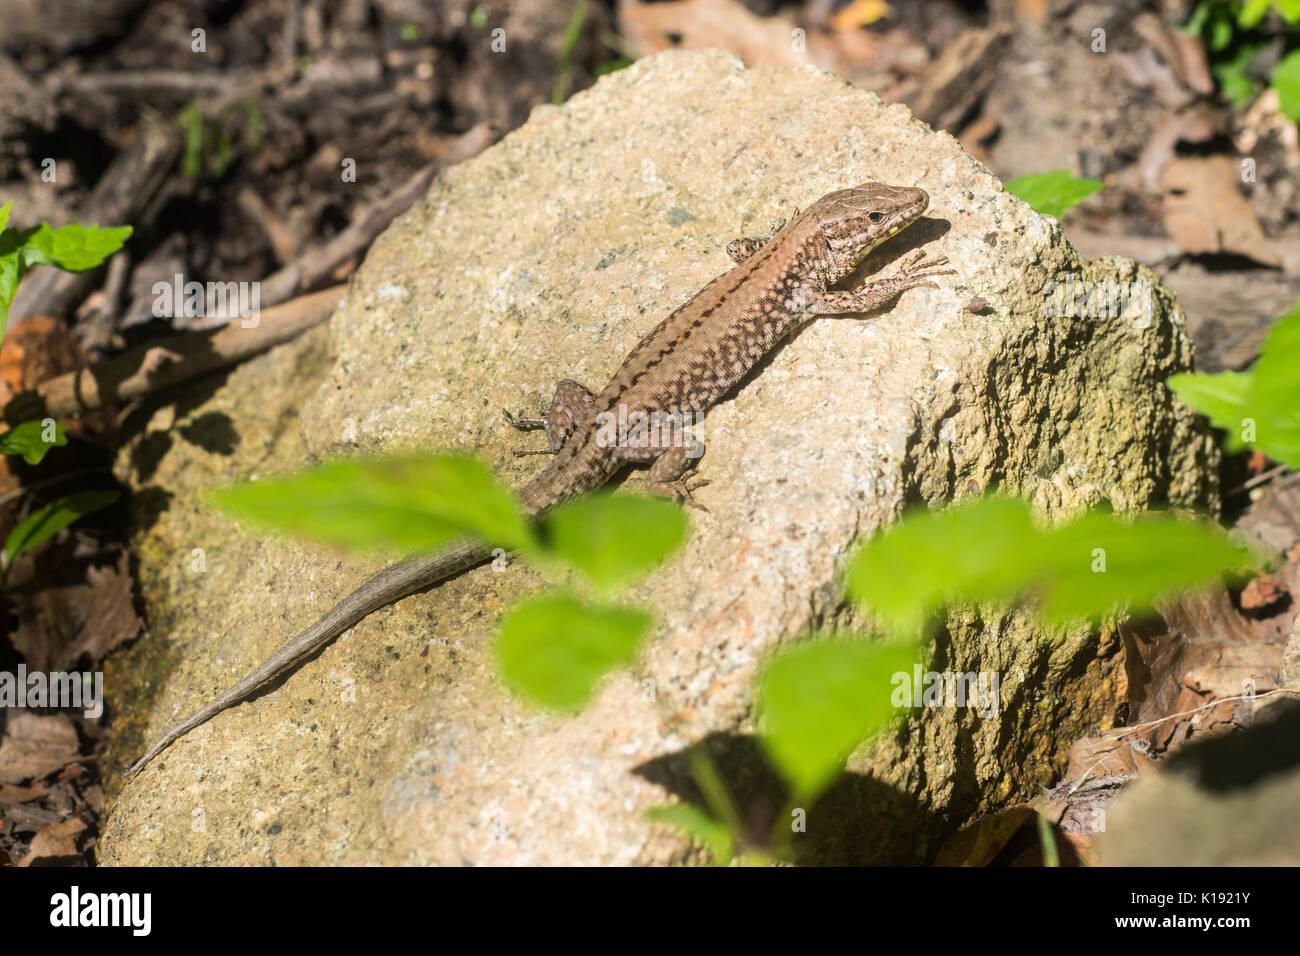 Beautiful lizard in Montseny (Catalonia) - Stock Image